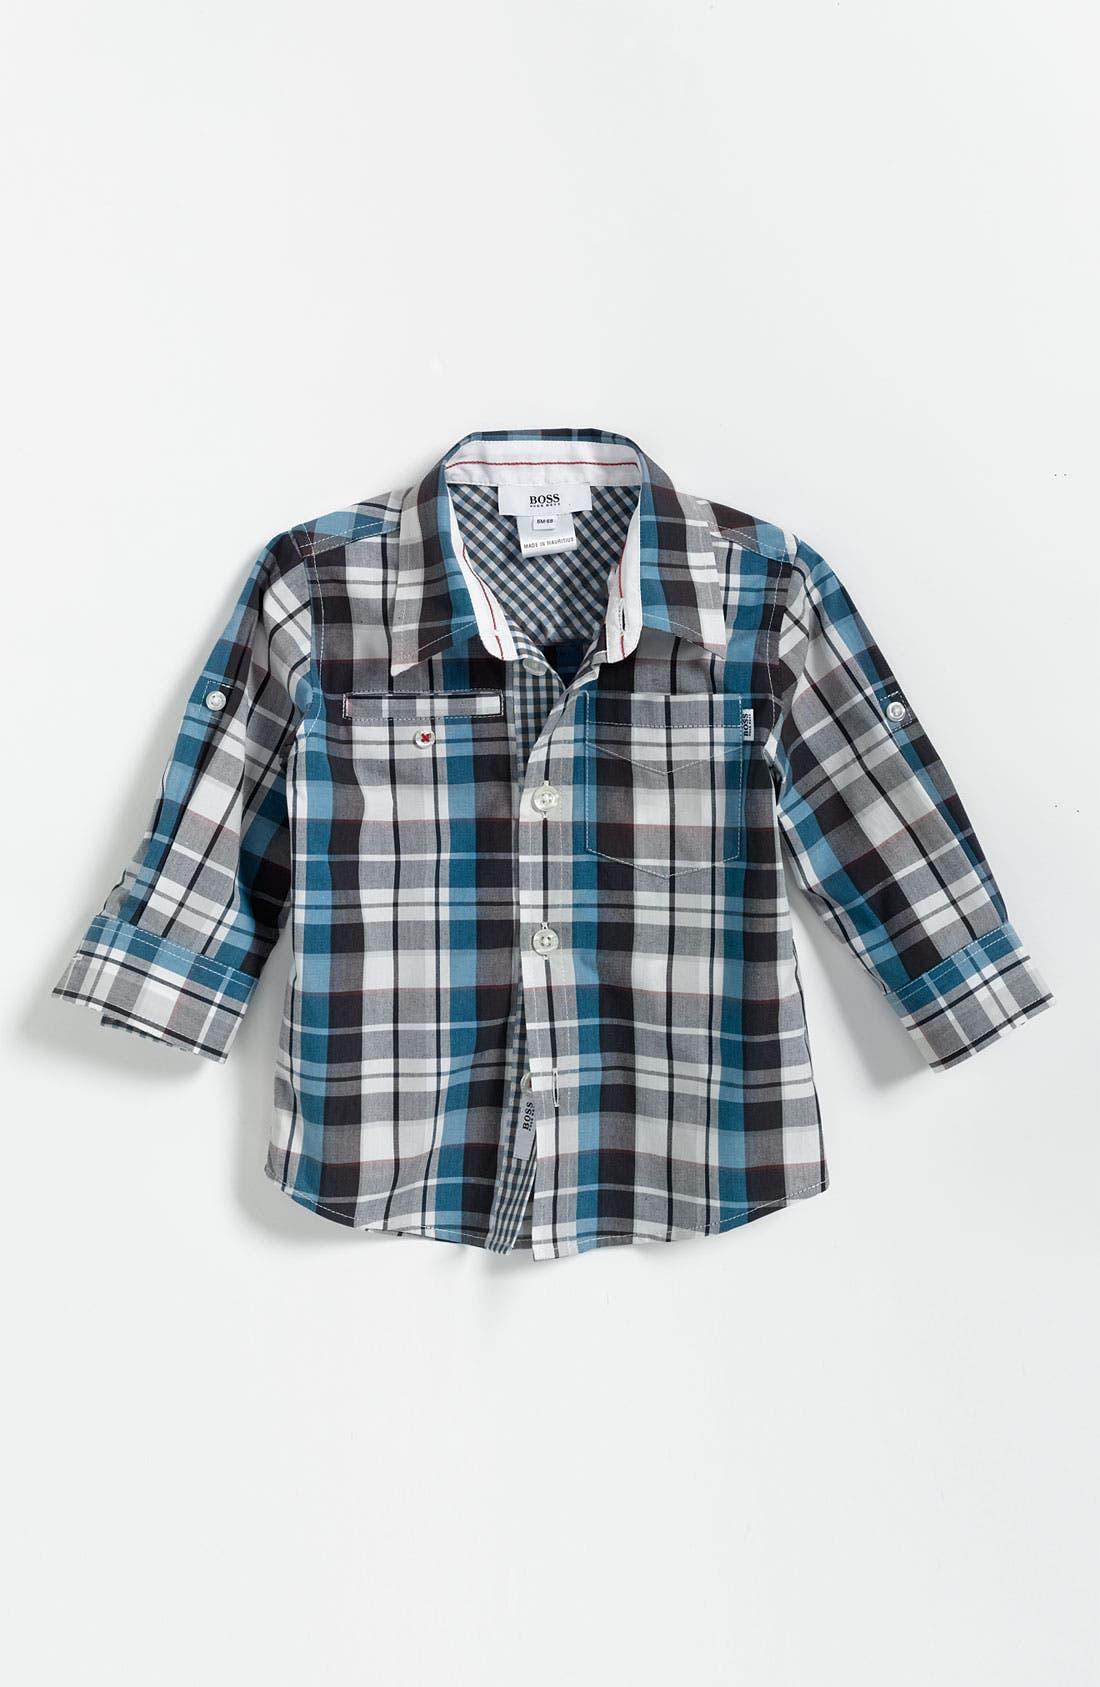 Alternate Image 1 Selected - BOSS Kidswear Check Print Shirt (Toddler)